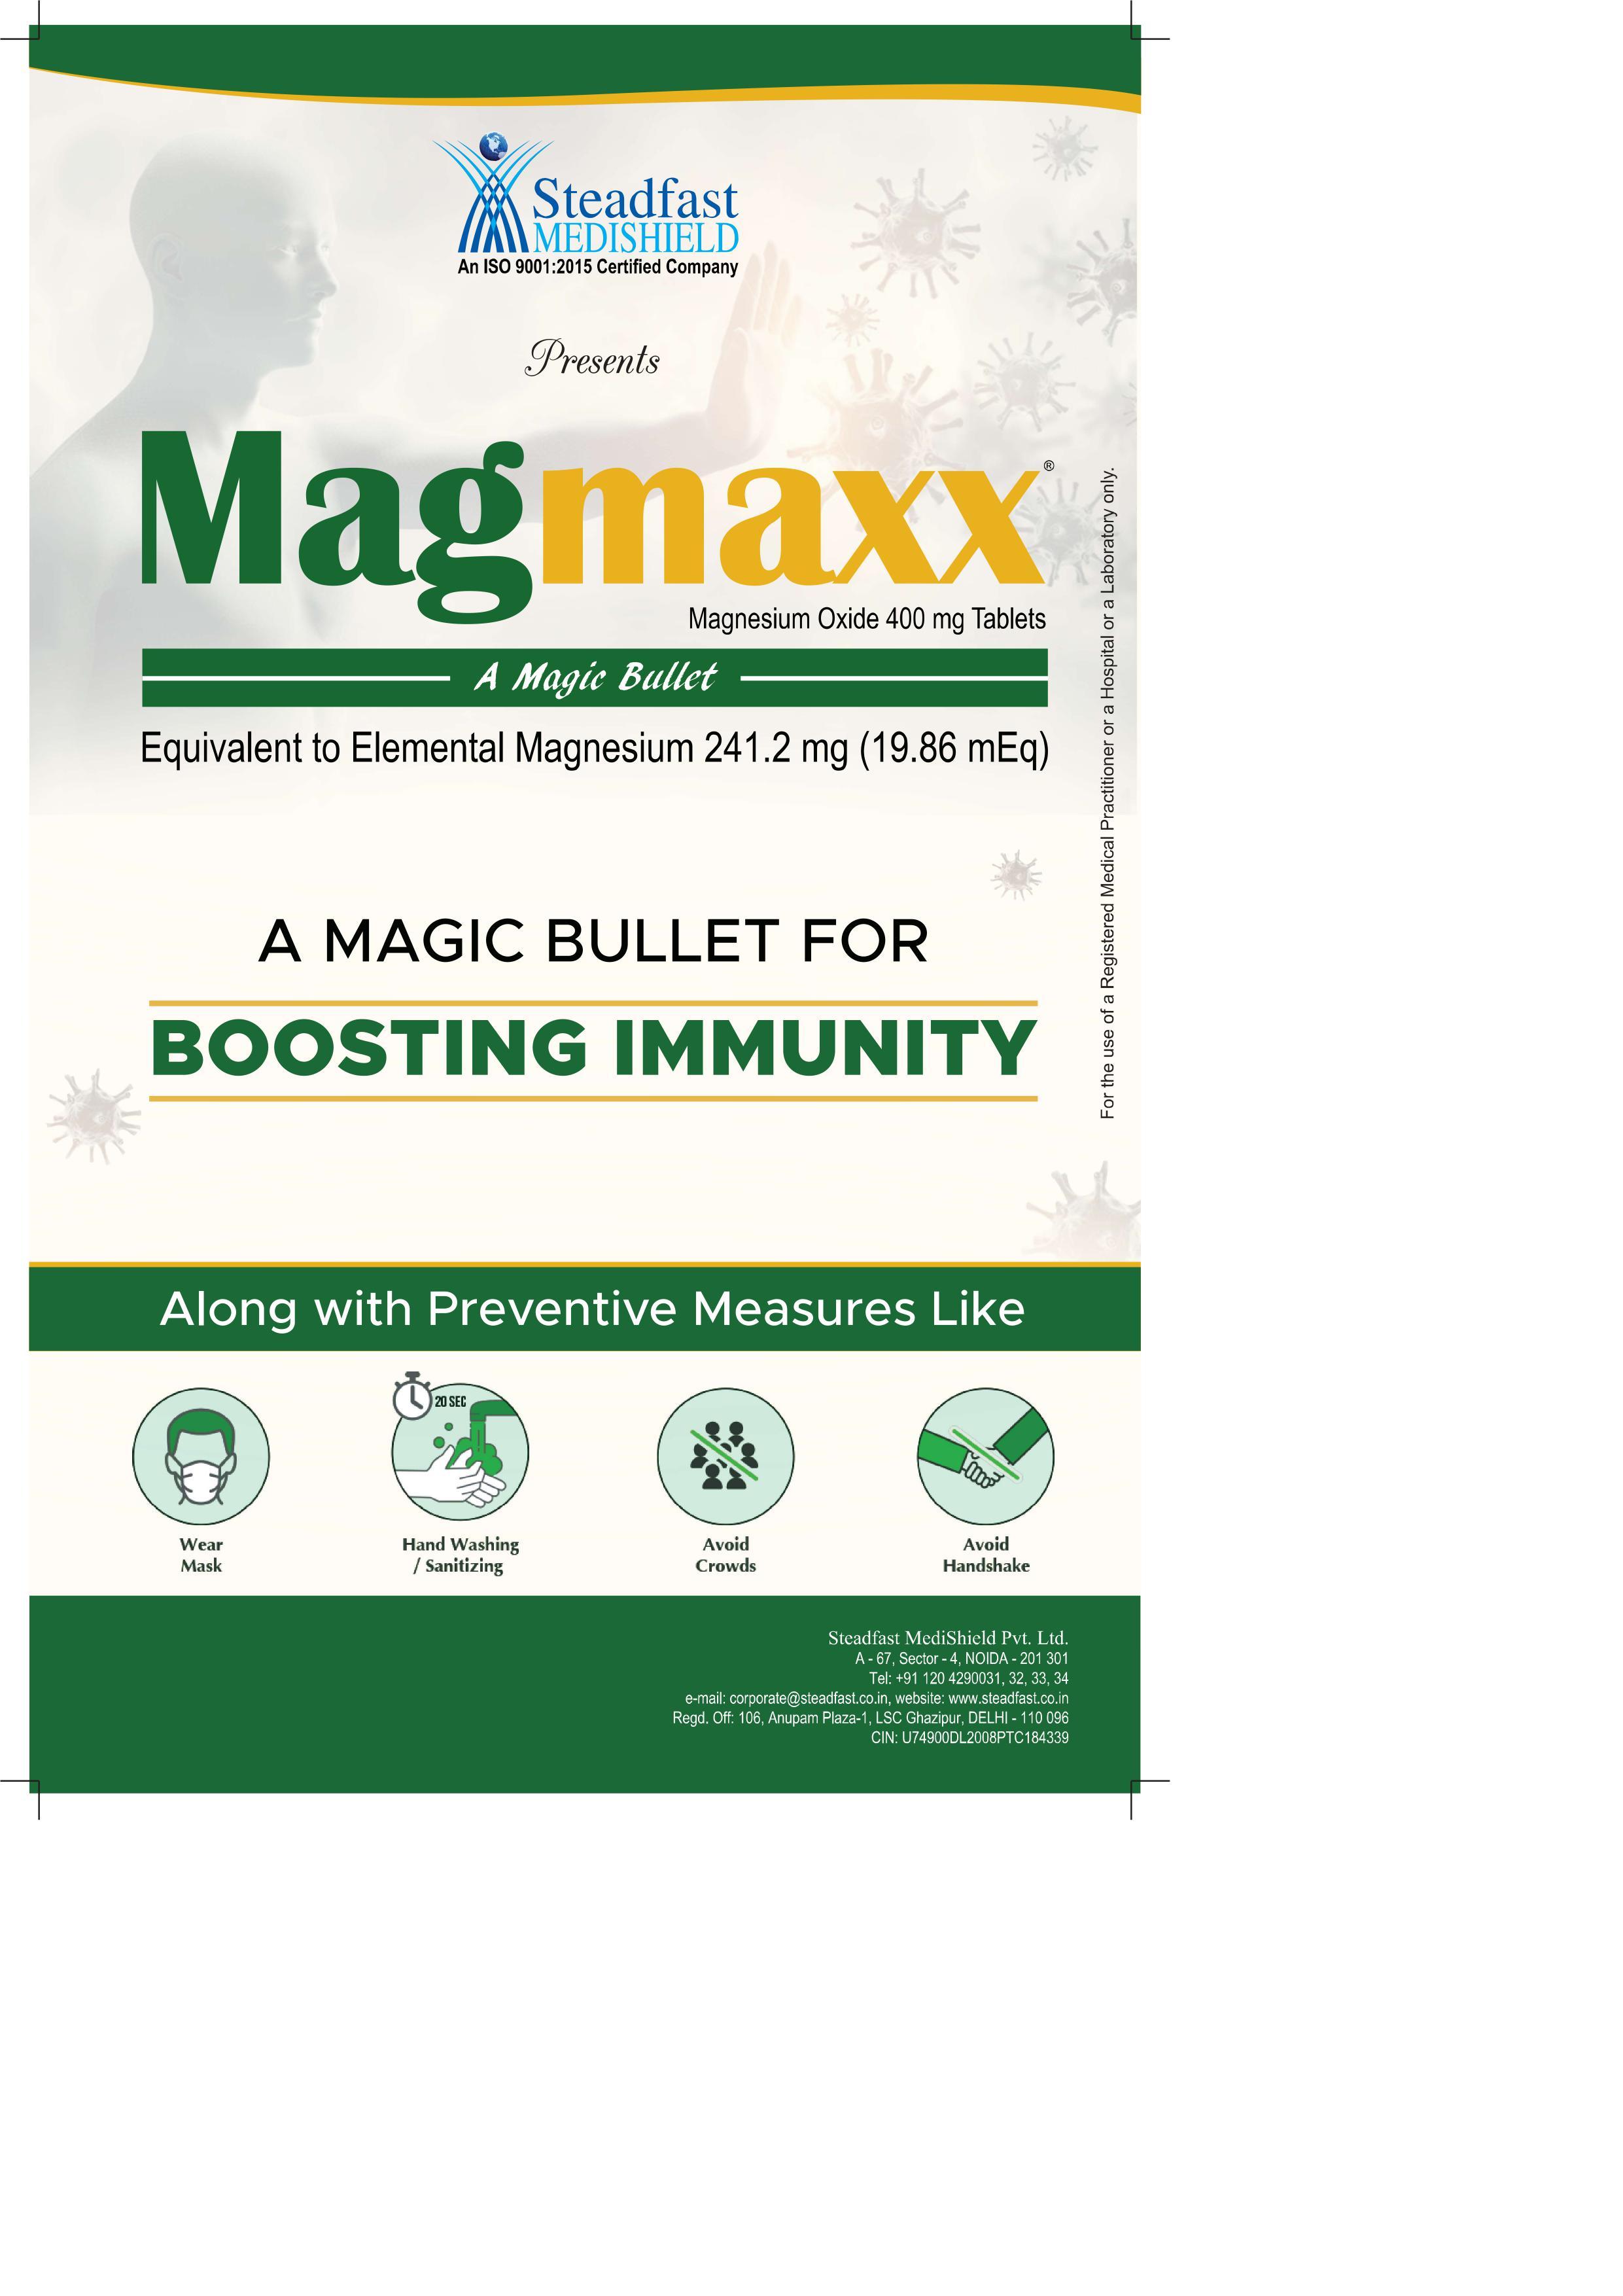 Magmaxx A Magic Bullet For Boosting Immunity